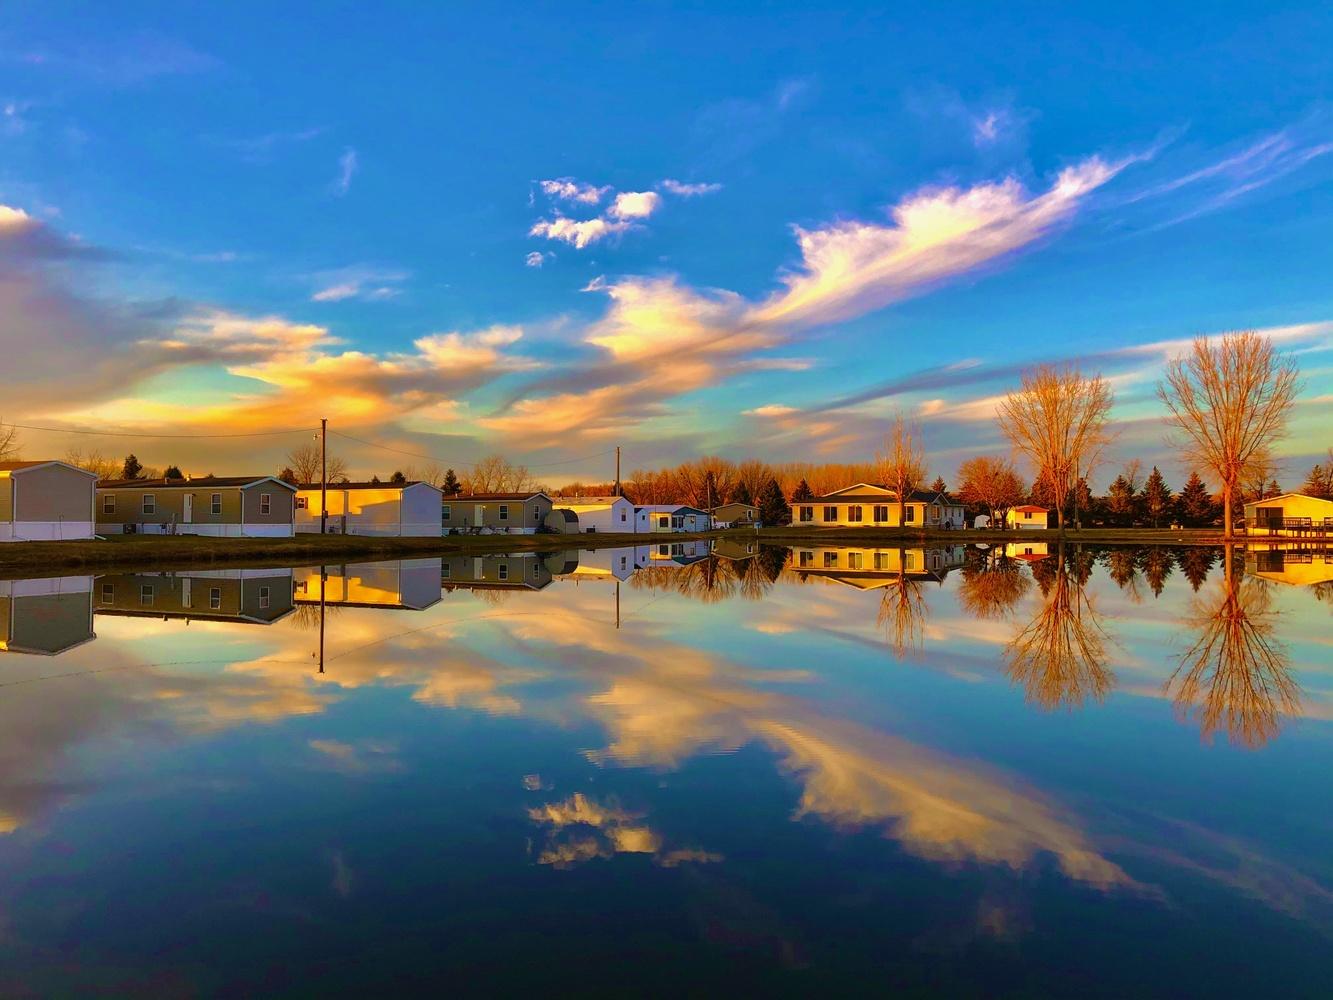 Pond by Dan Santema